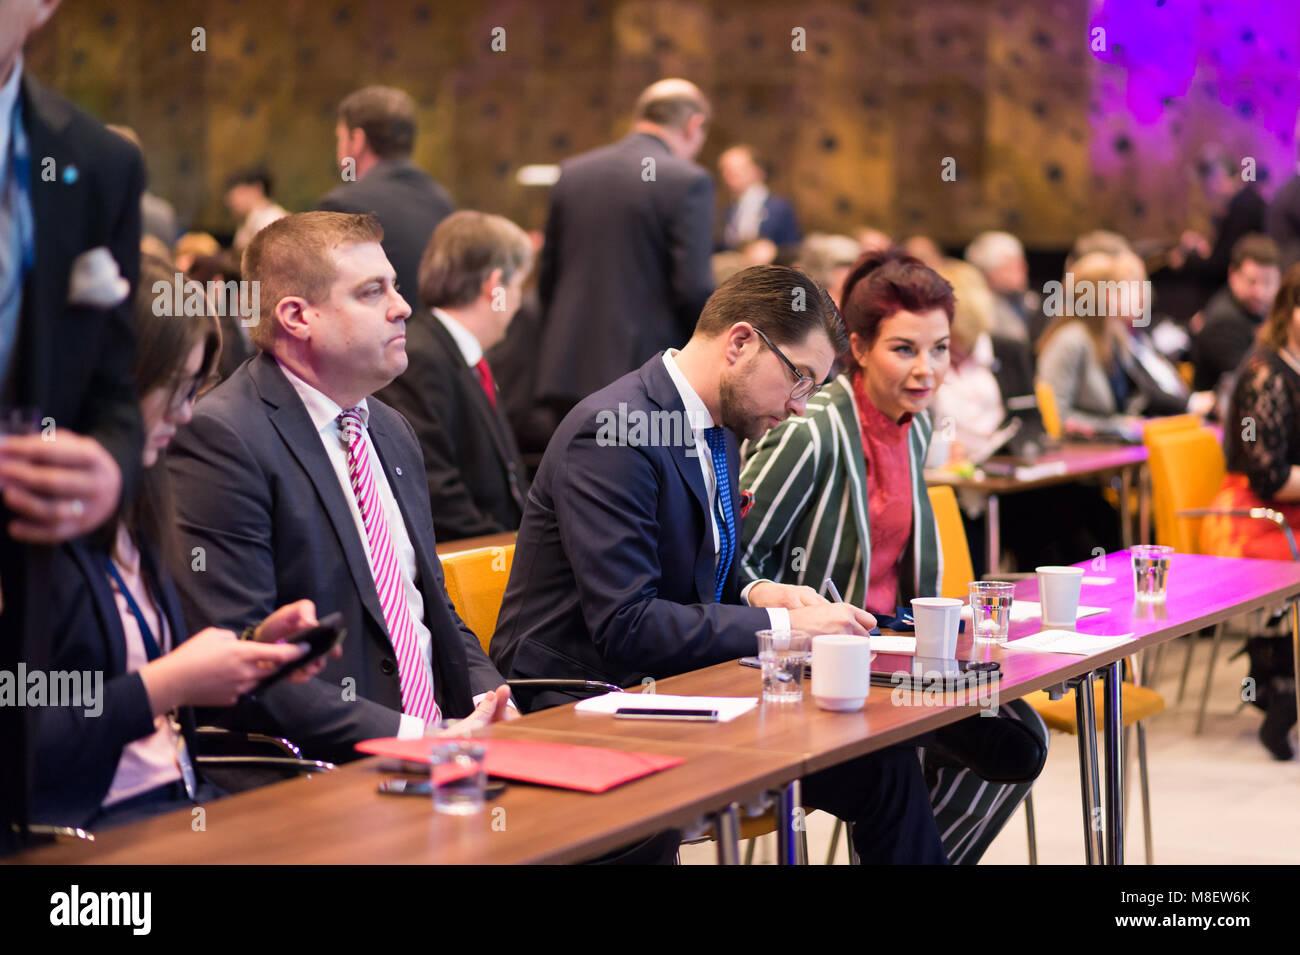 Stockholm, Sweden, March 17, 2018. Sweden Democrats (SD) Election Conference 2018. Political Secretary Mikael Eriksson, - Stock Image